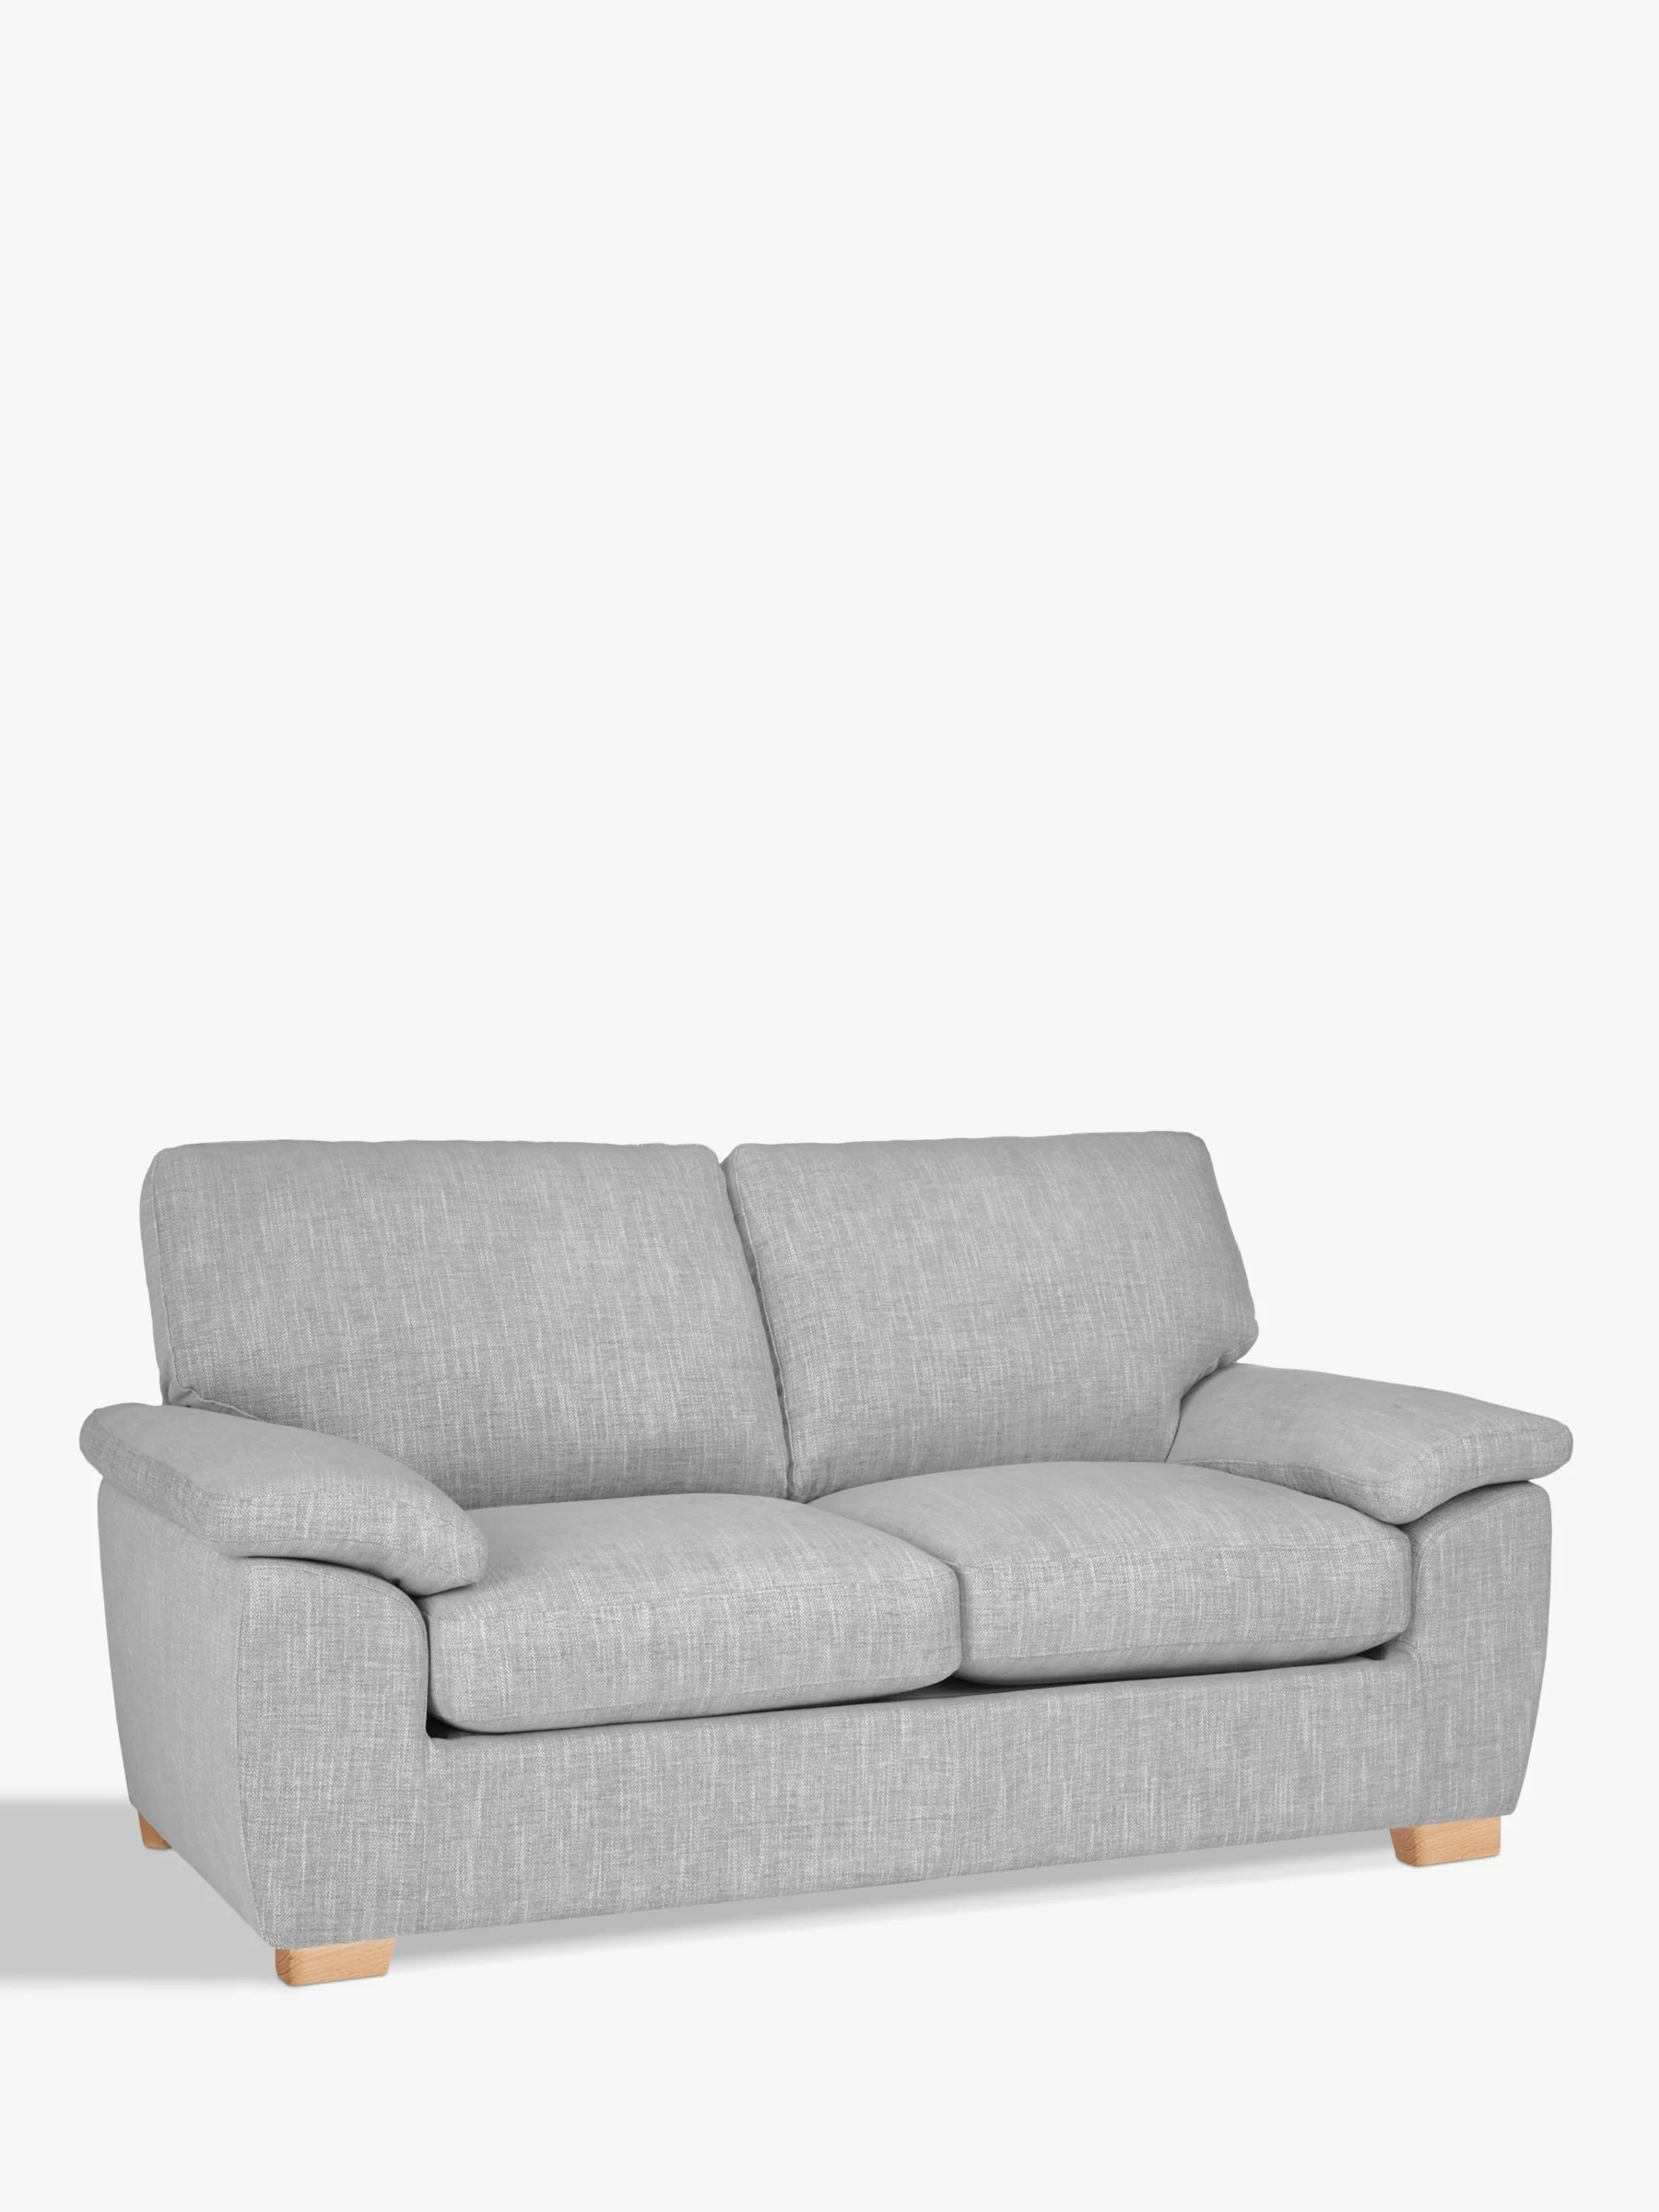 camden sofa bed where can i buy a baci living room